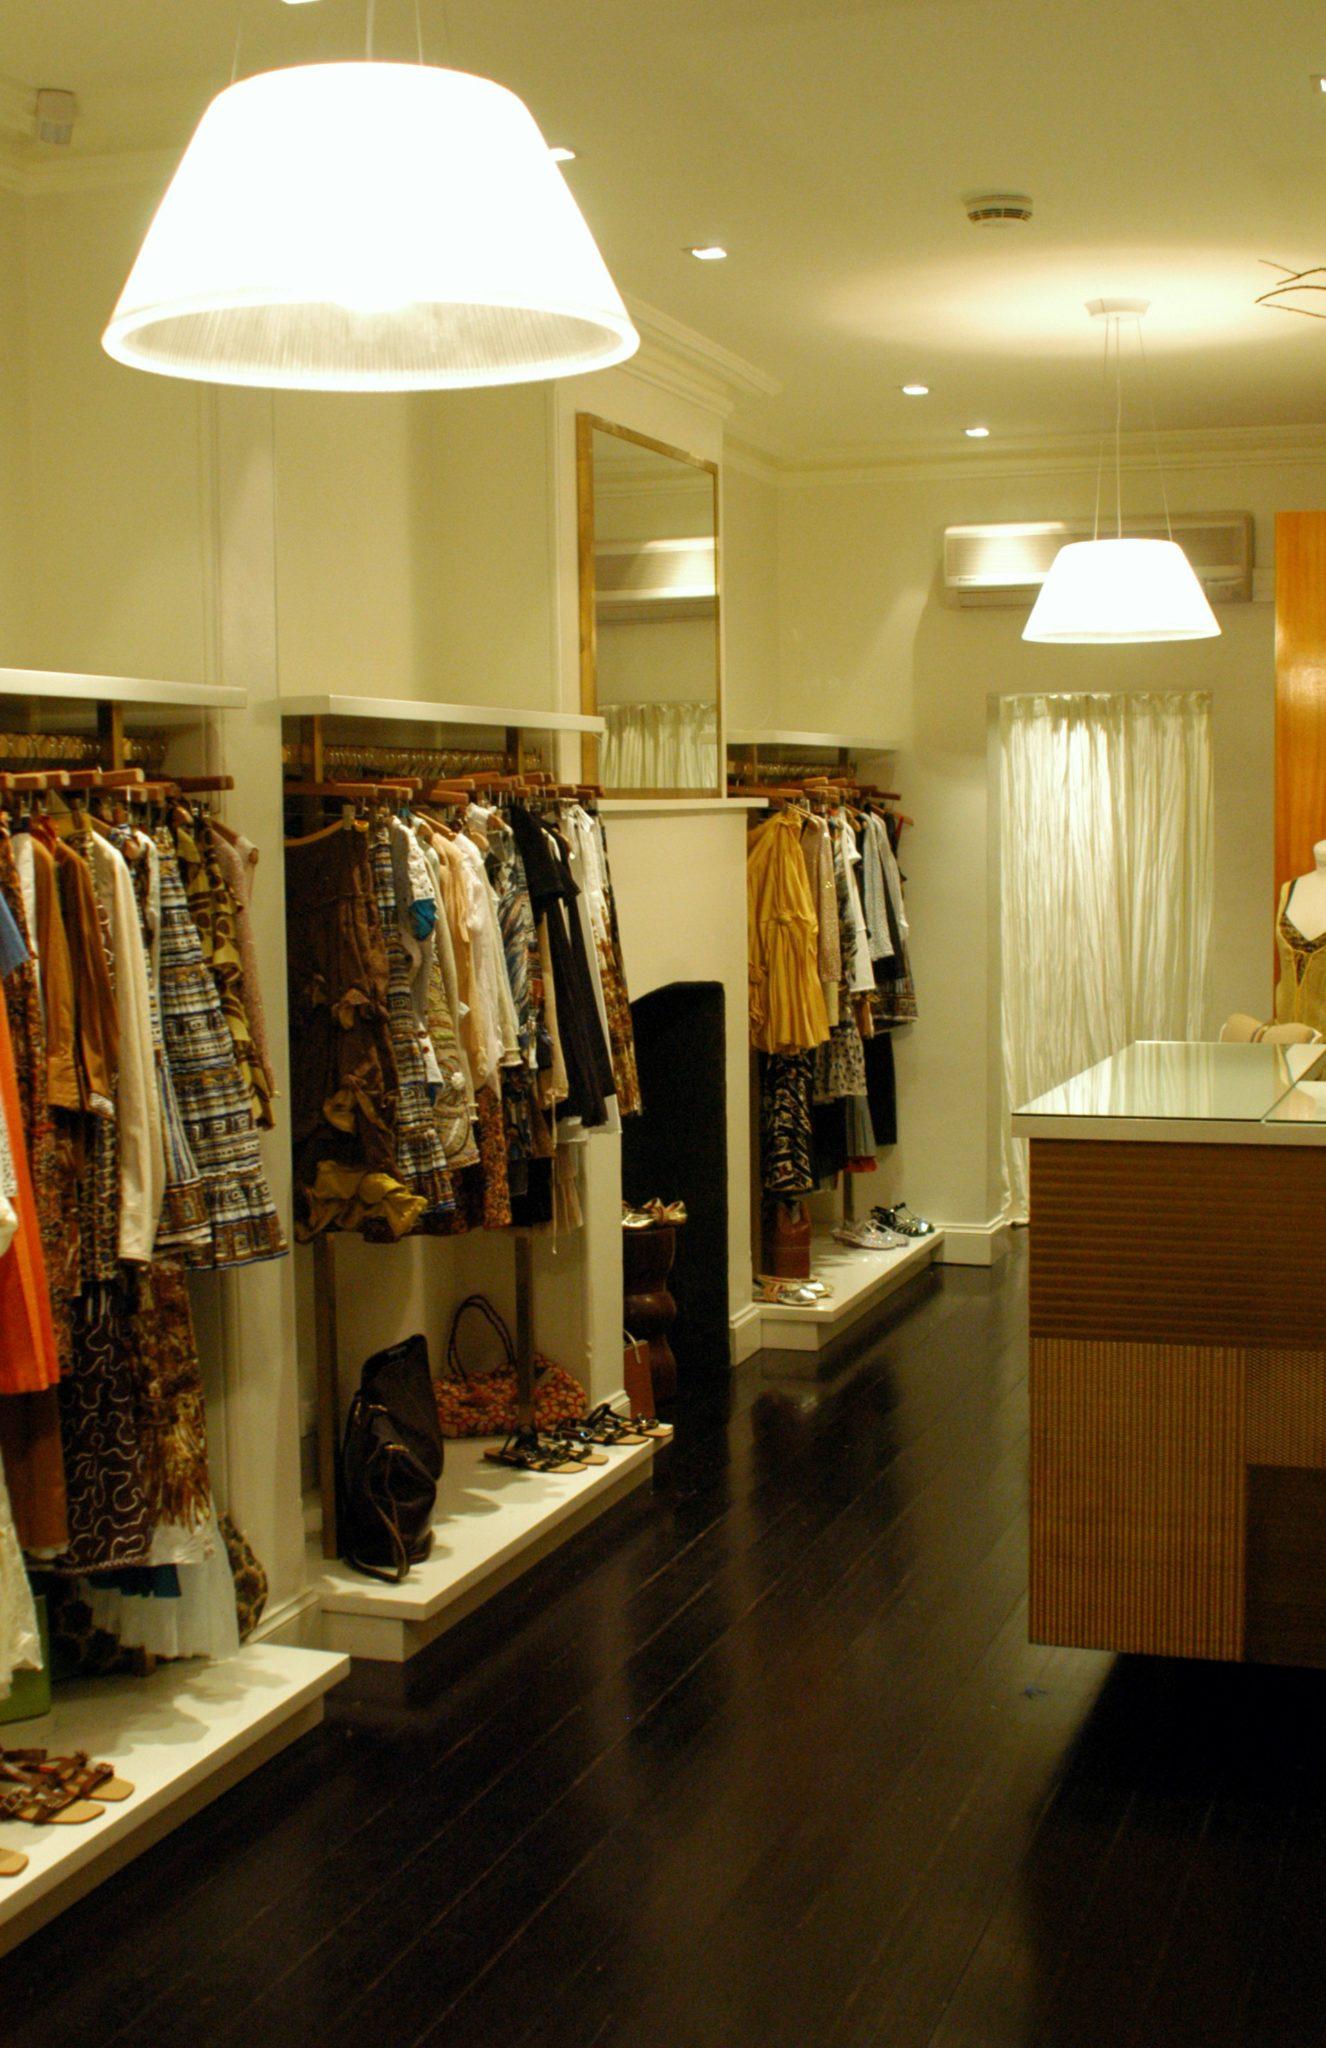 Lighting for Fashion retail in Paddington Sydney by Limelight Australia